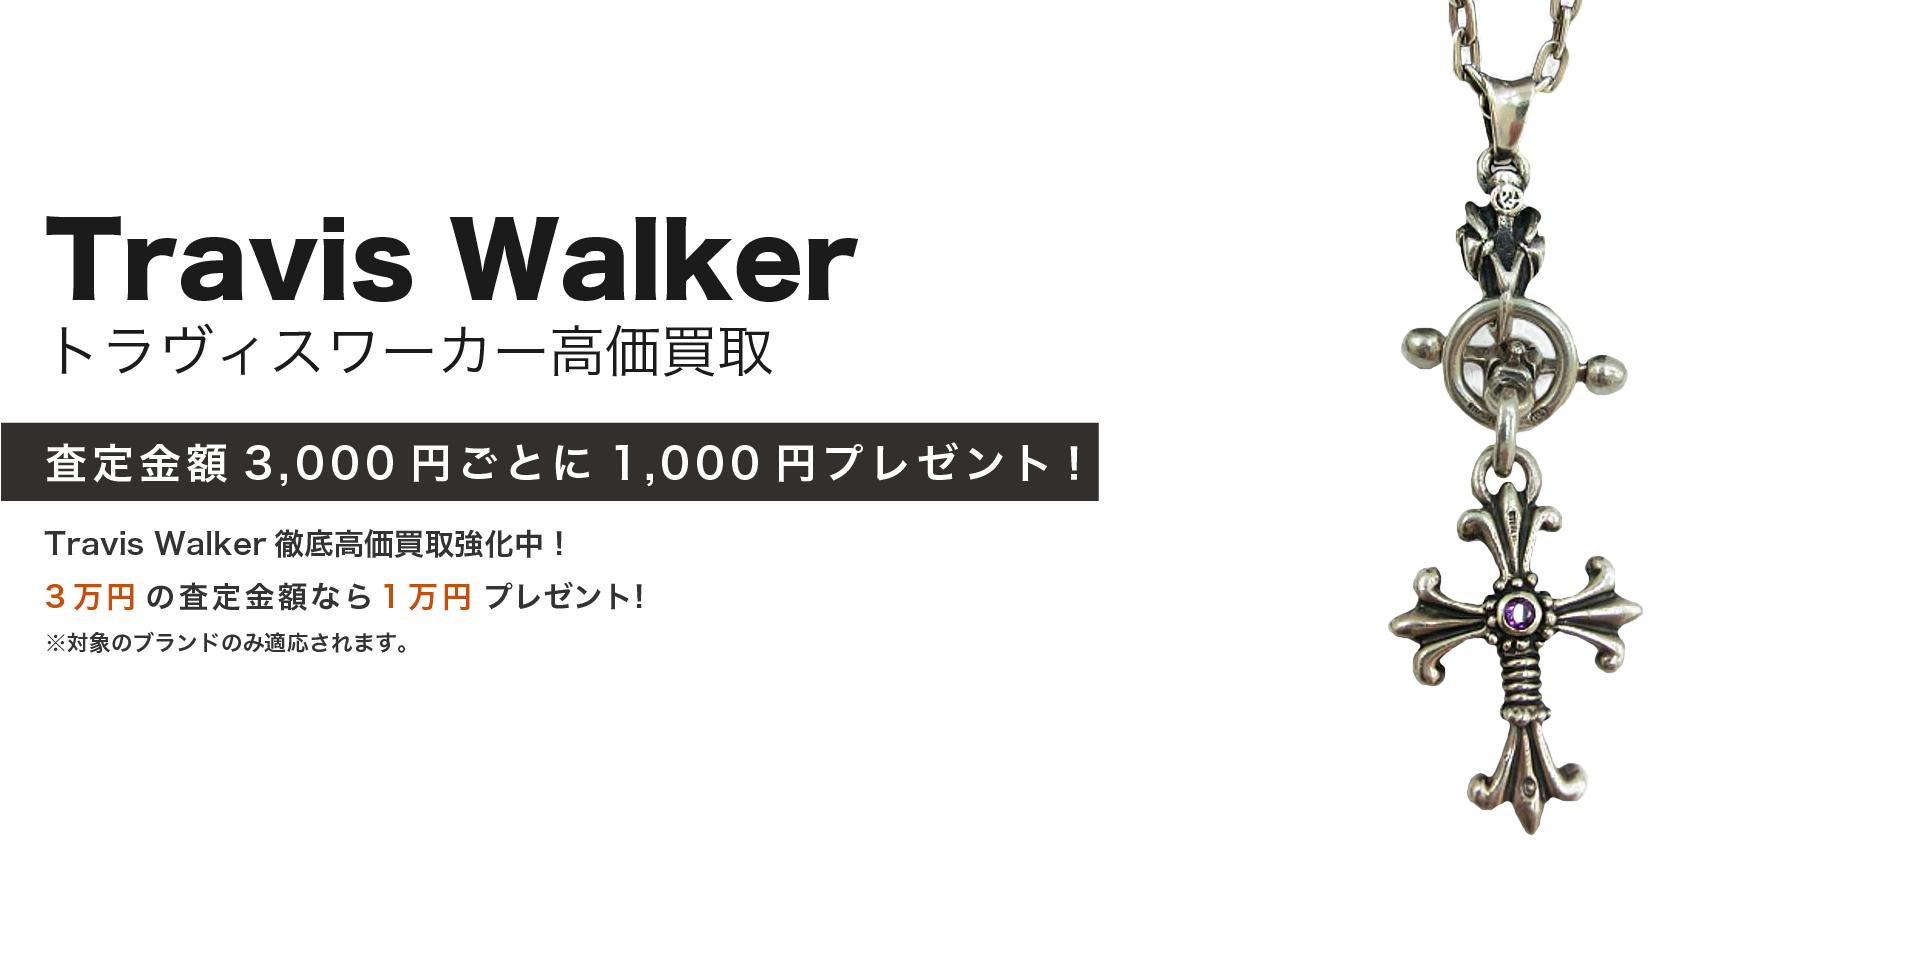 Travis Walkerのキービジュアル